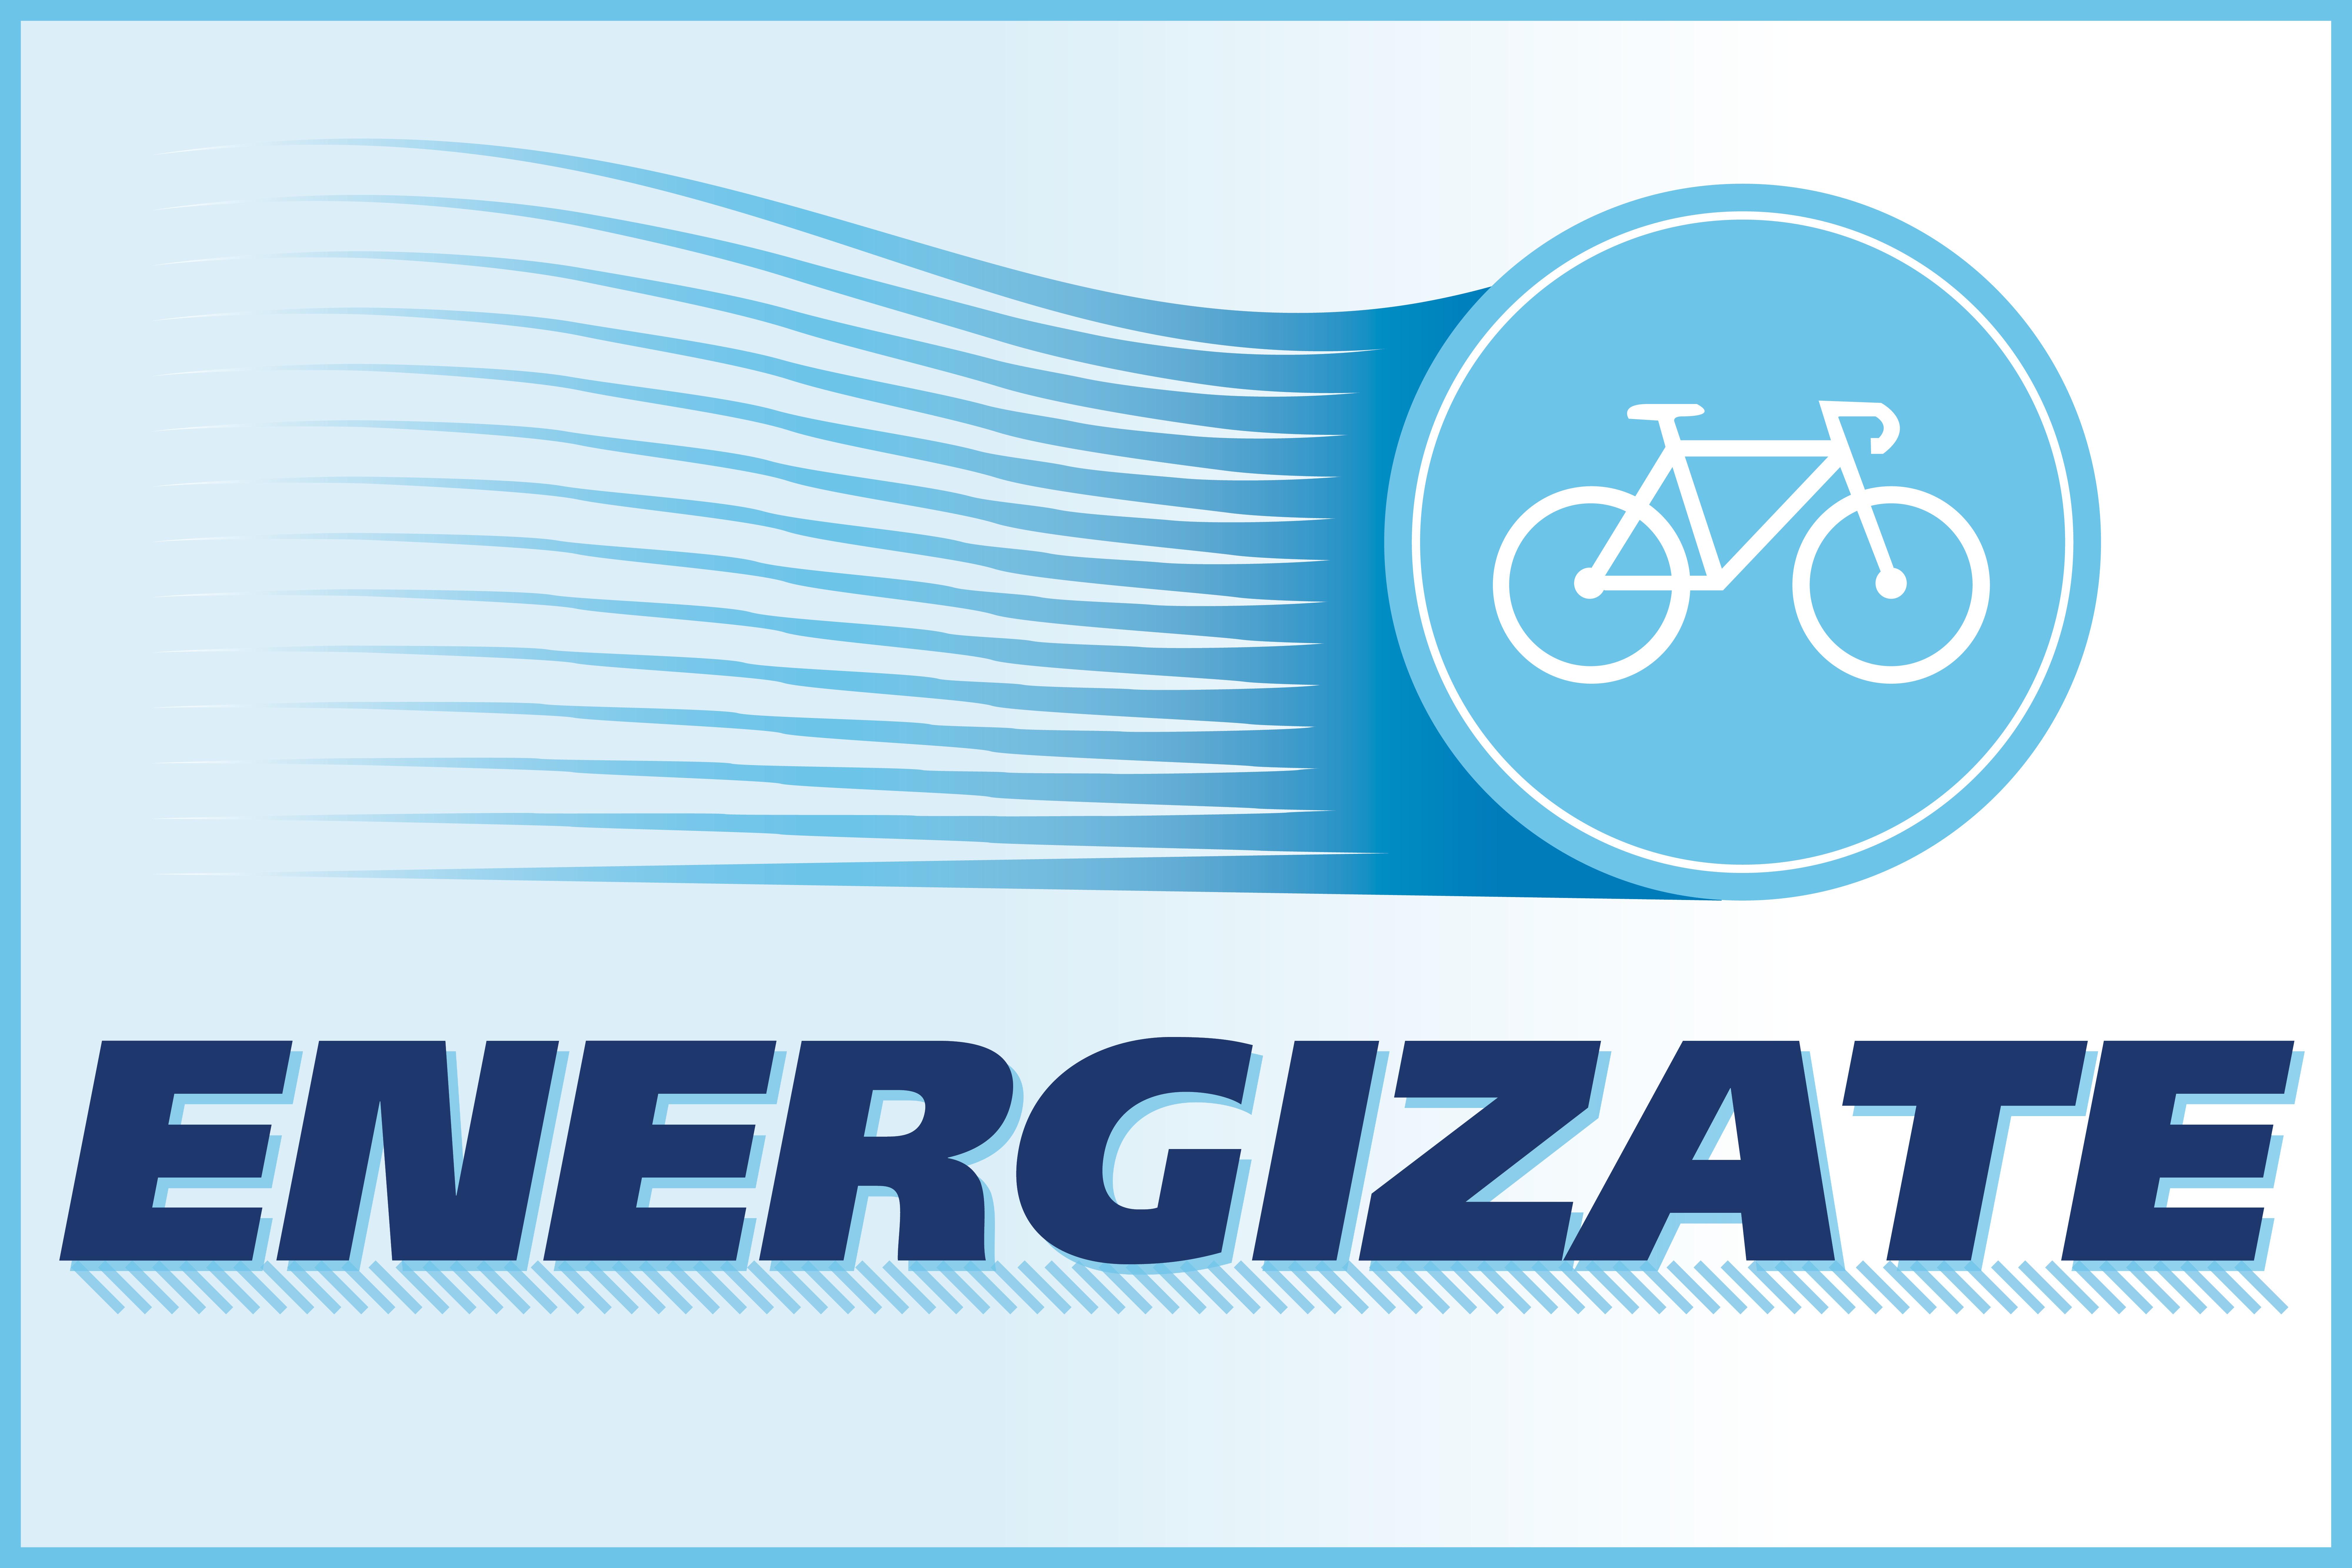 Muevase Naturalmente - Energizate